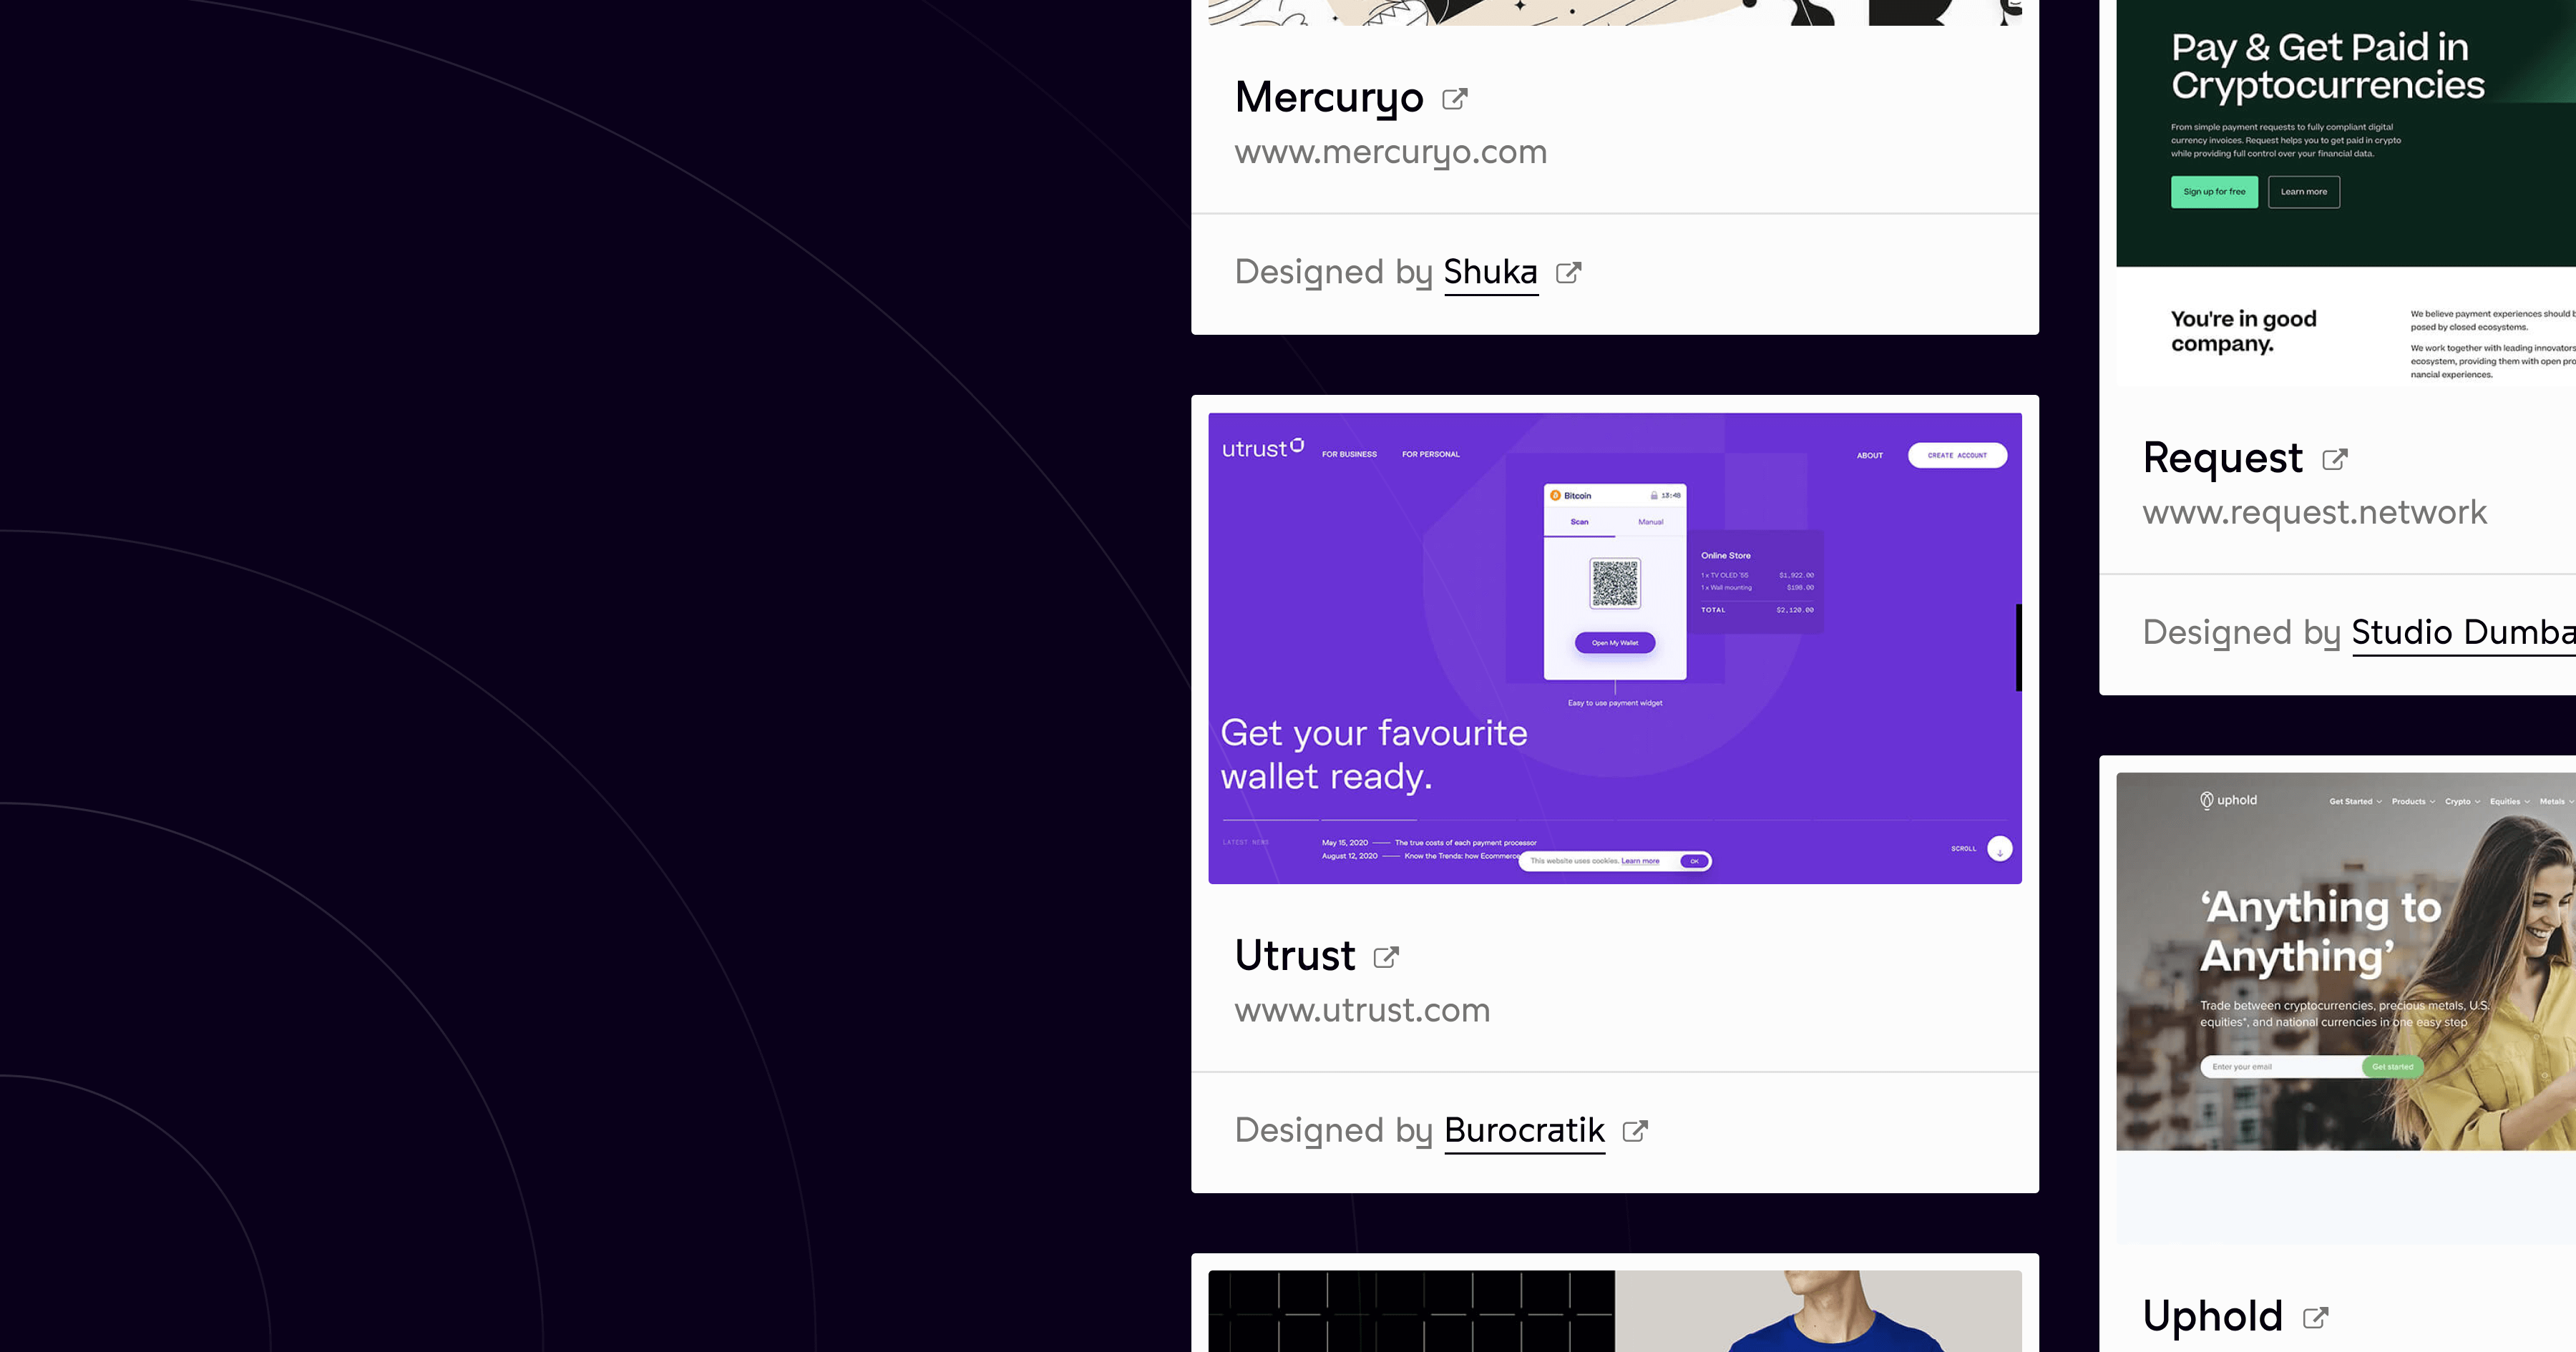 Our cryptobrands website